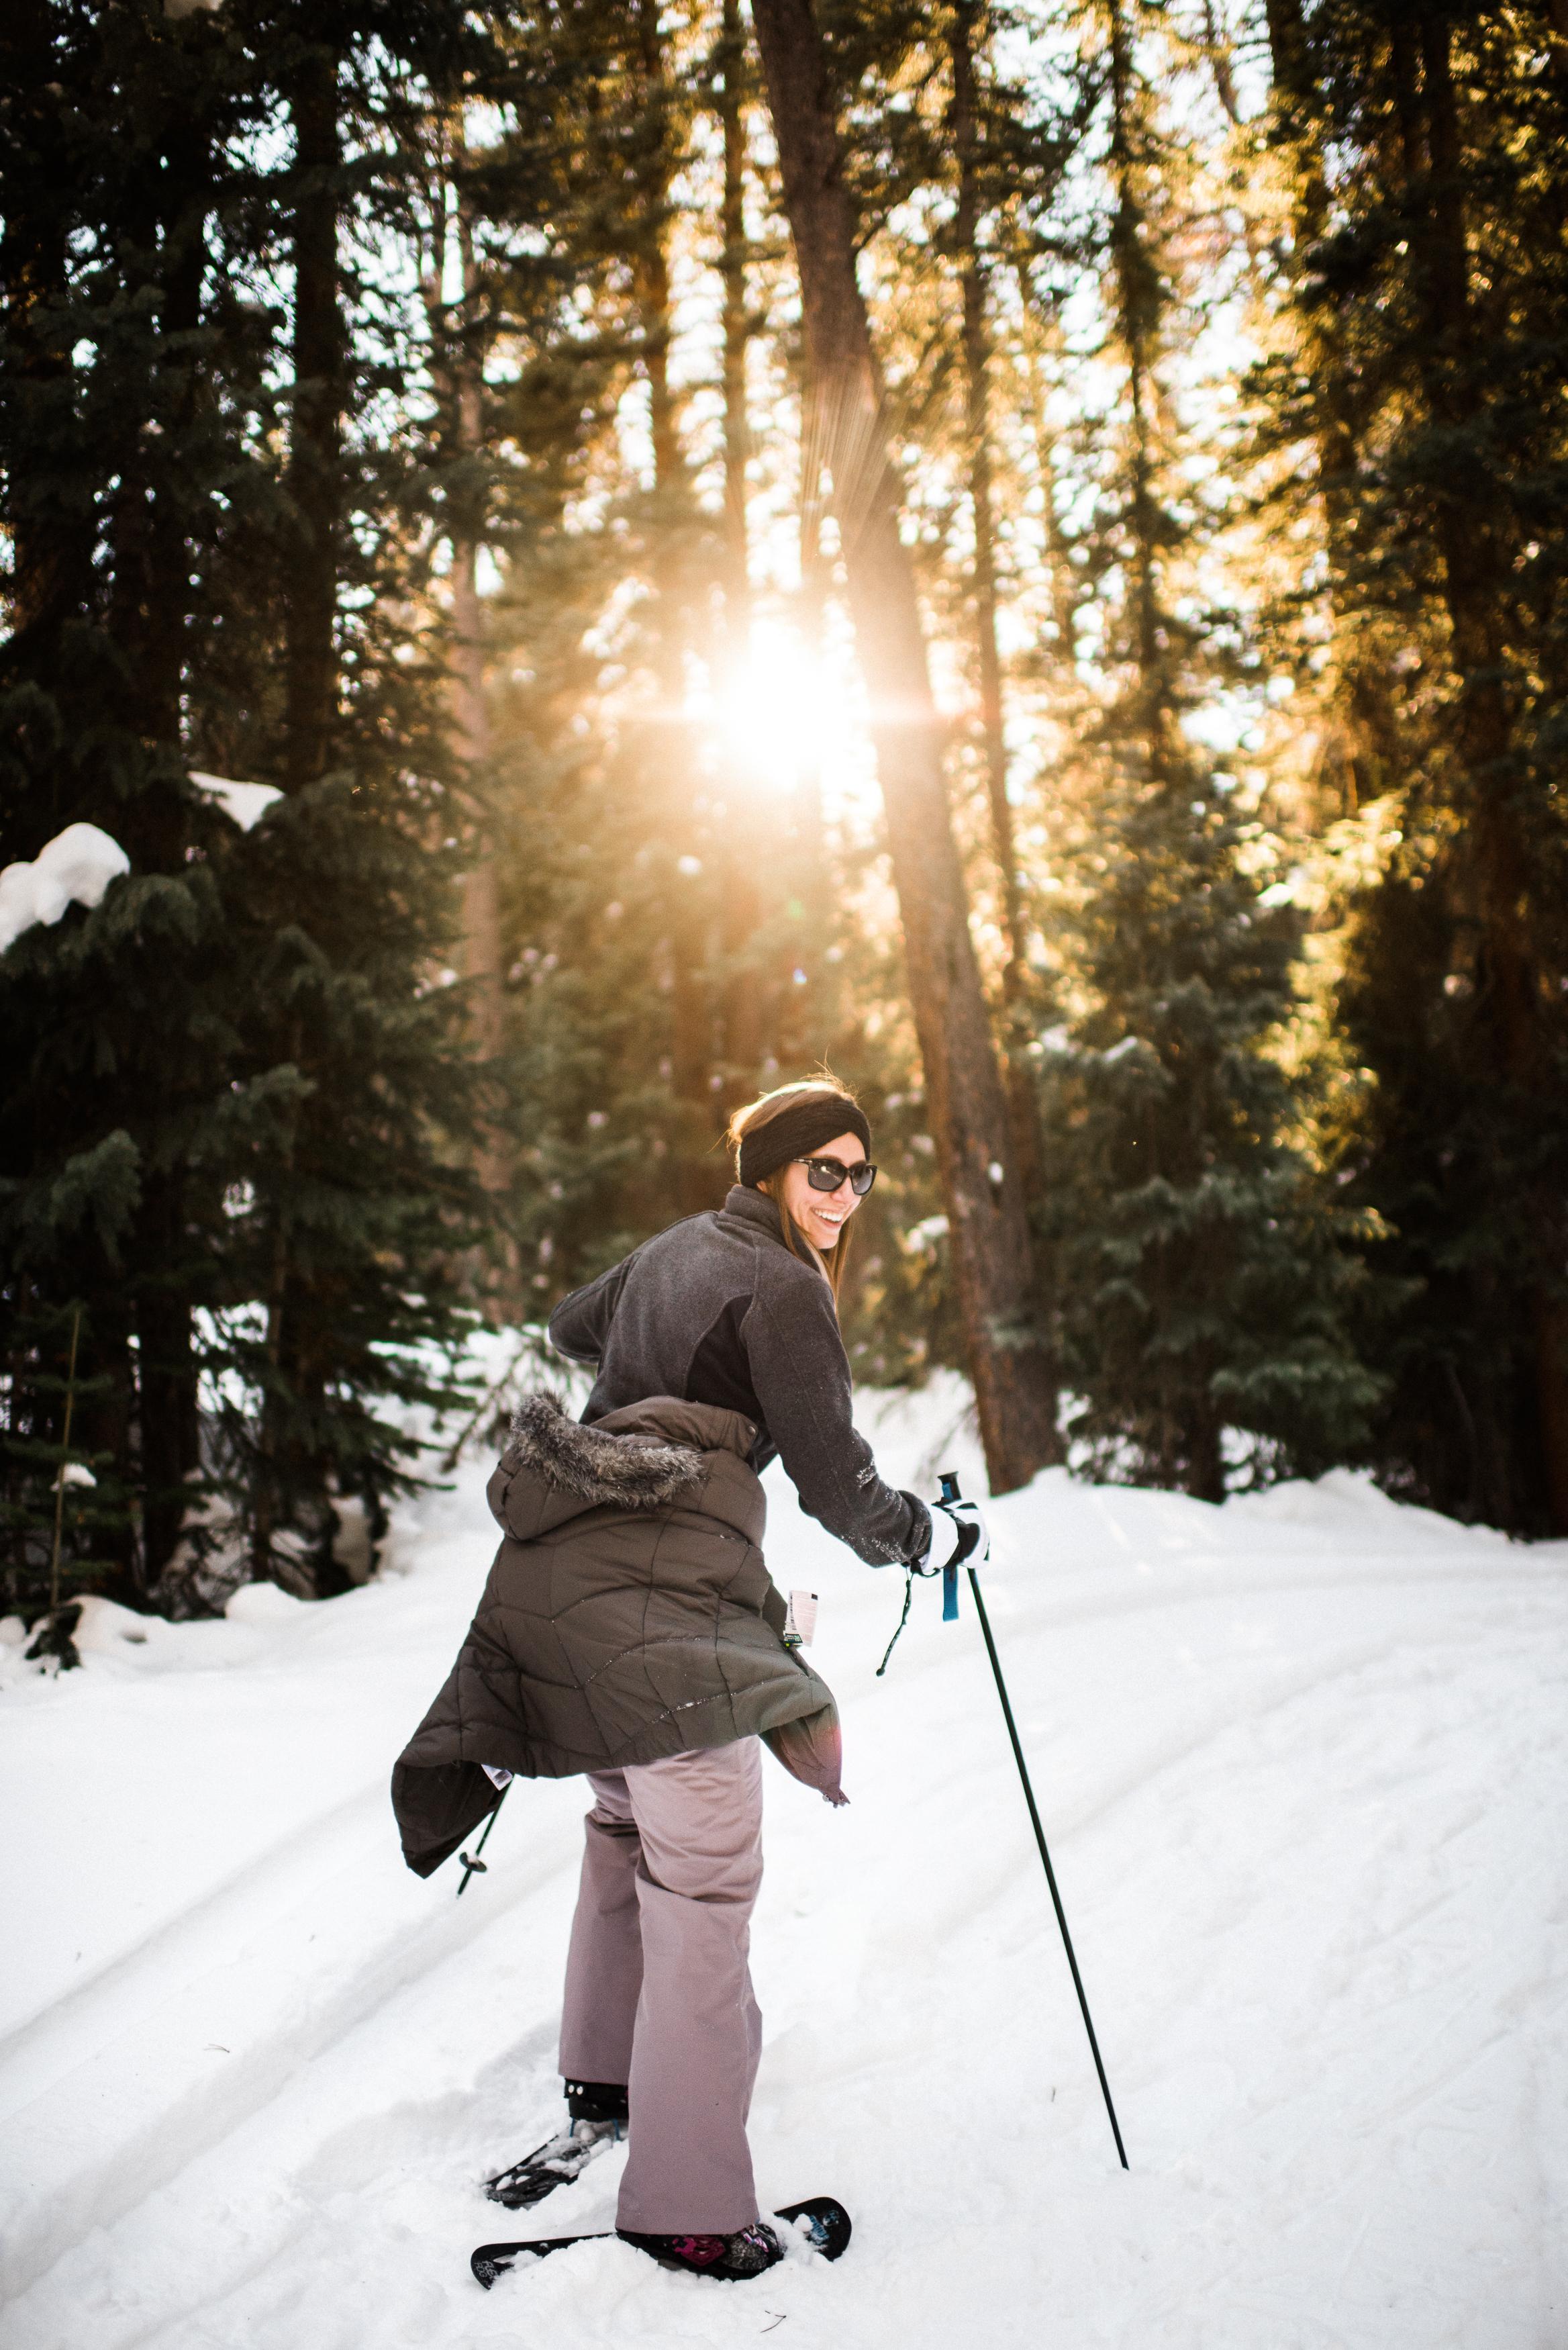 TaraShupe_Outdoor_Photographer_Loweprobags_Colorado_Copper_Mountains_Ski_81.jpg